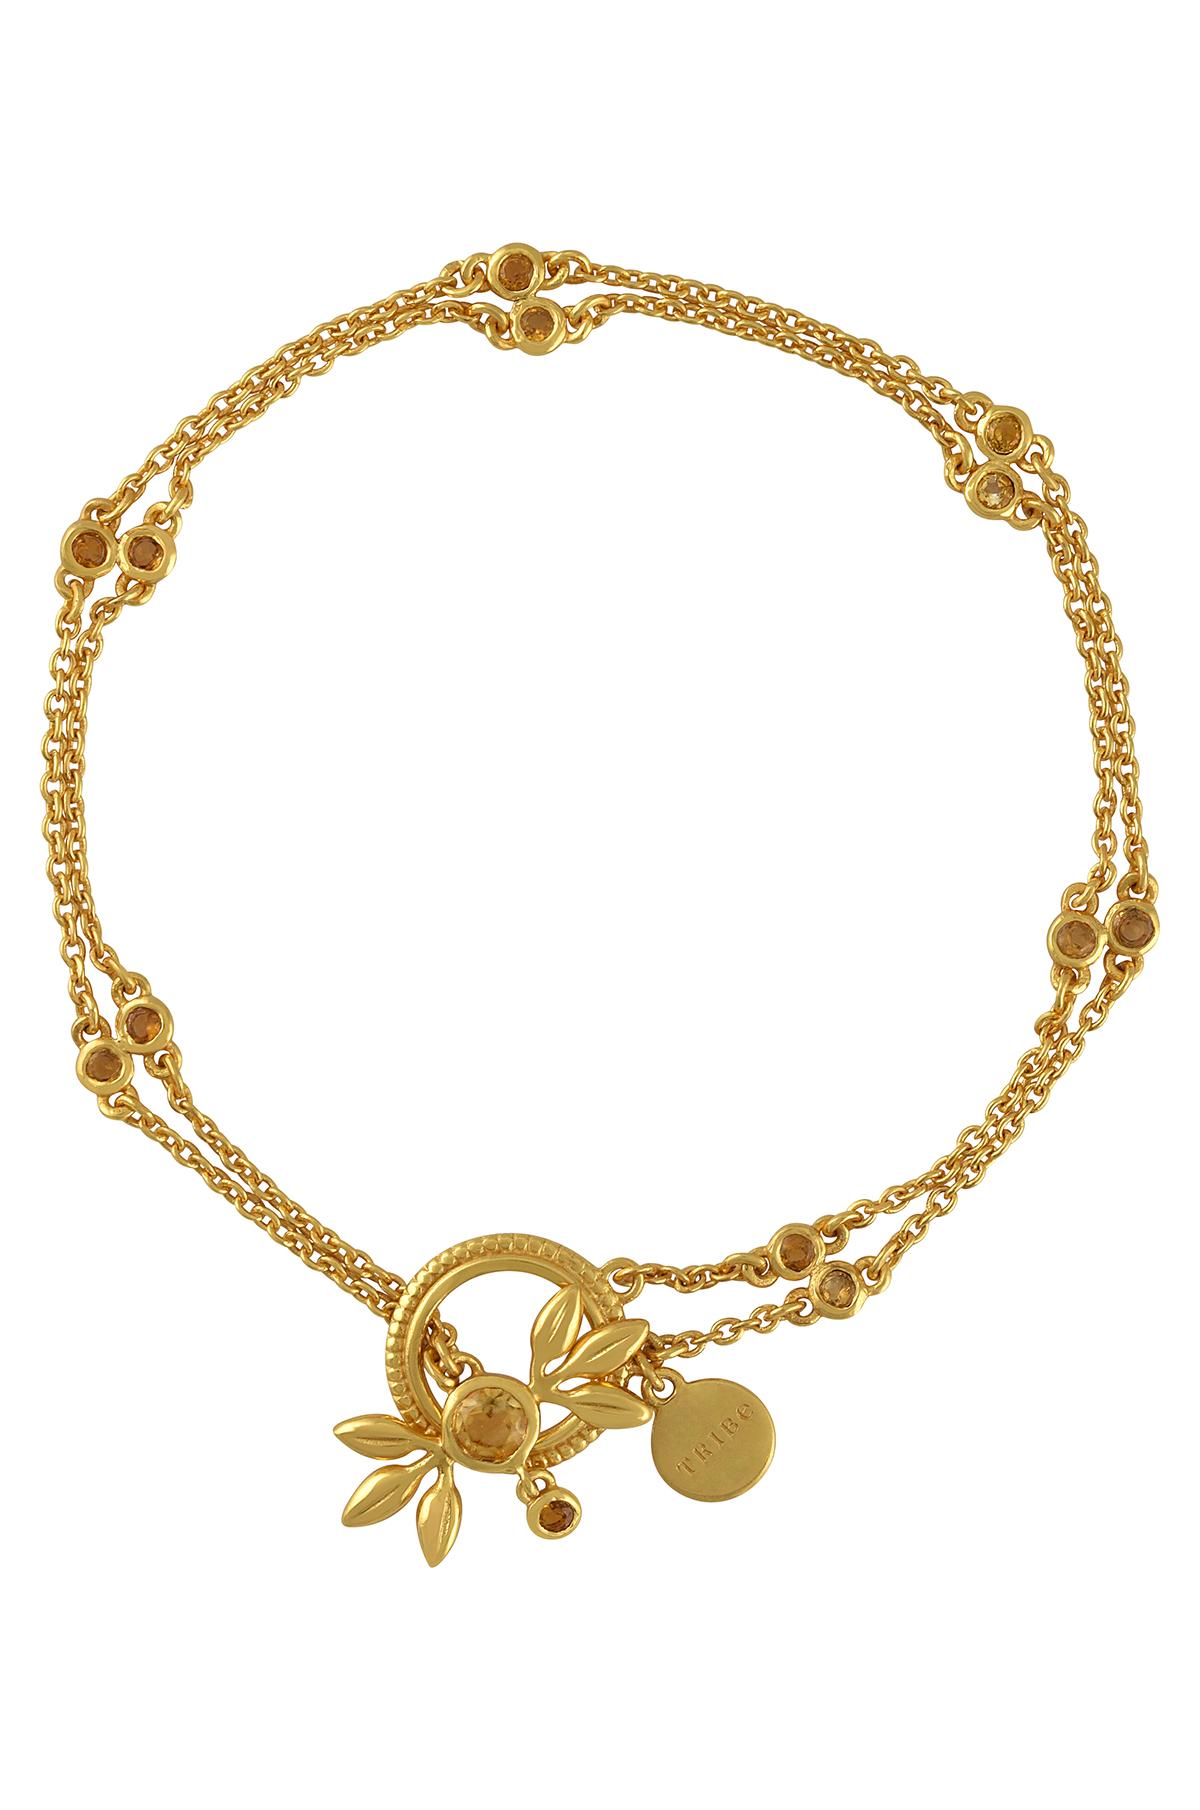 Silver Gold Plated Citrine Flower Chain Bracelet